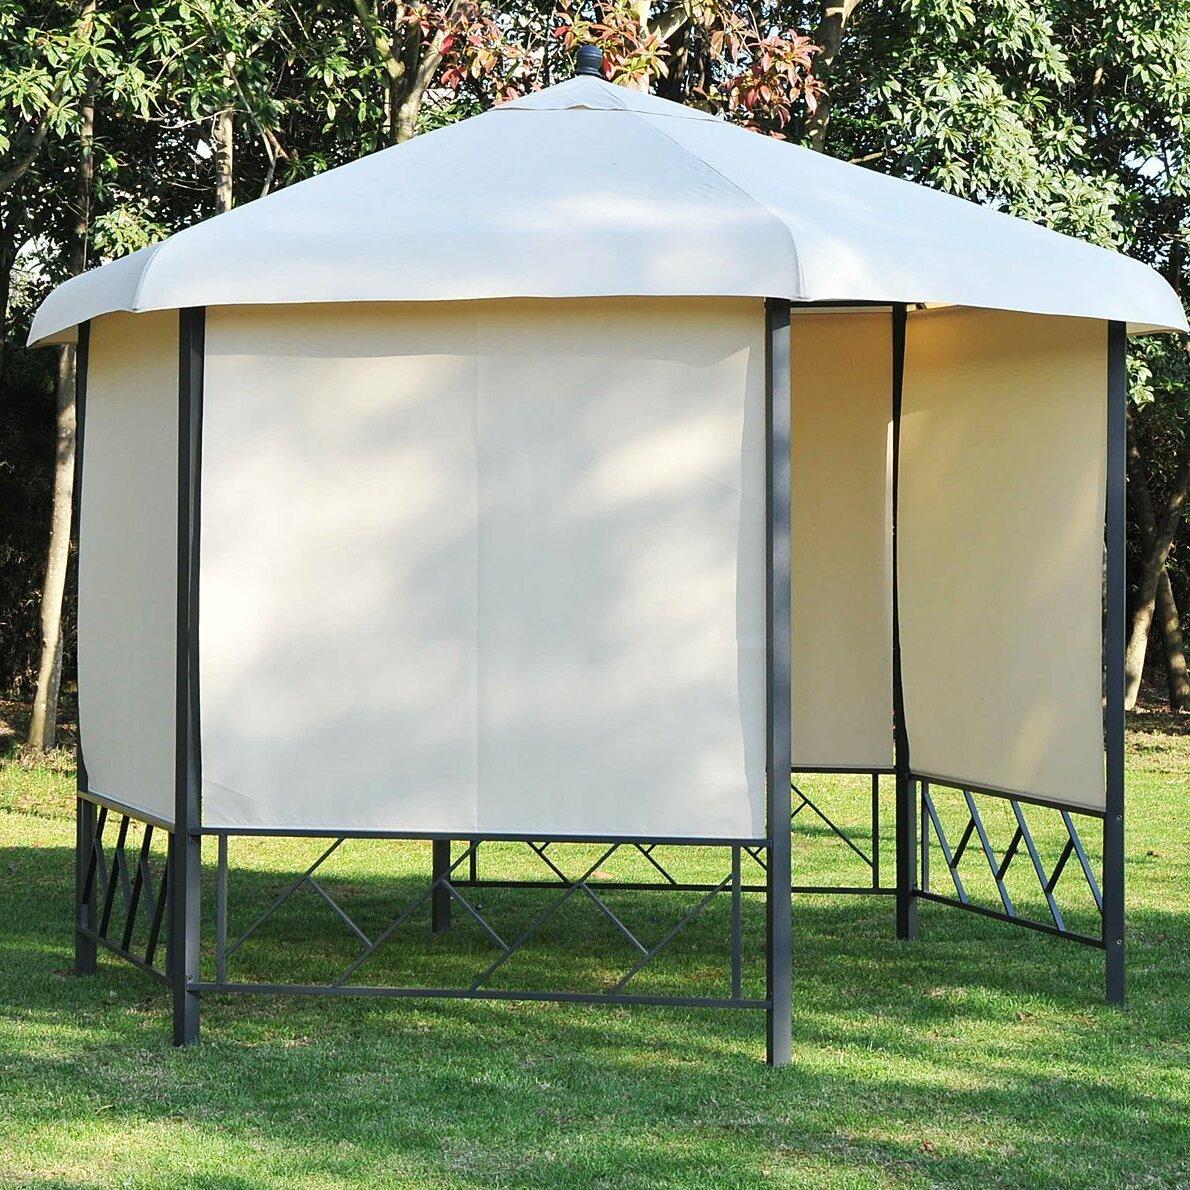 bel tage 3 5 m x 3 5 m pavillon outsunny aus metall. Black Bedroom Furniture Sets. Home Design Ideas